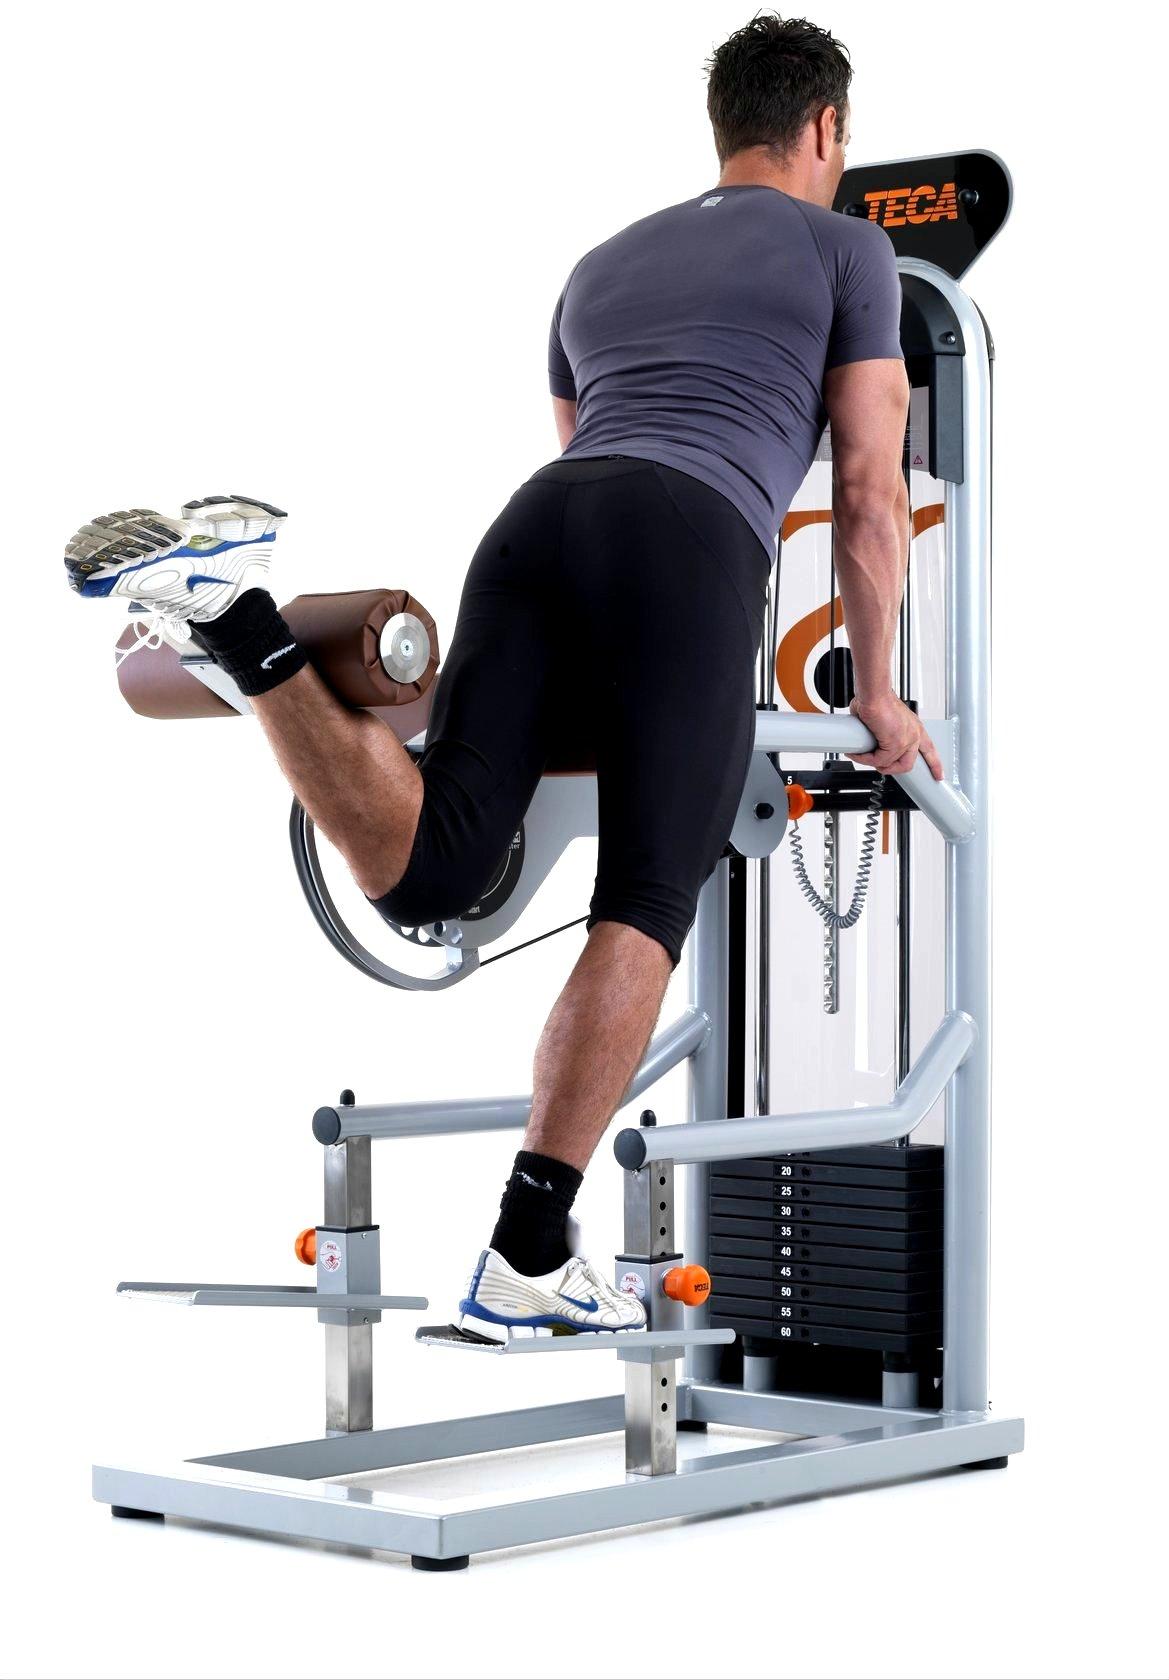 Medium Gluteus Teca Fitness Attrezzi Palestra E Attrezzi Fitness